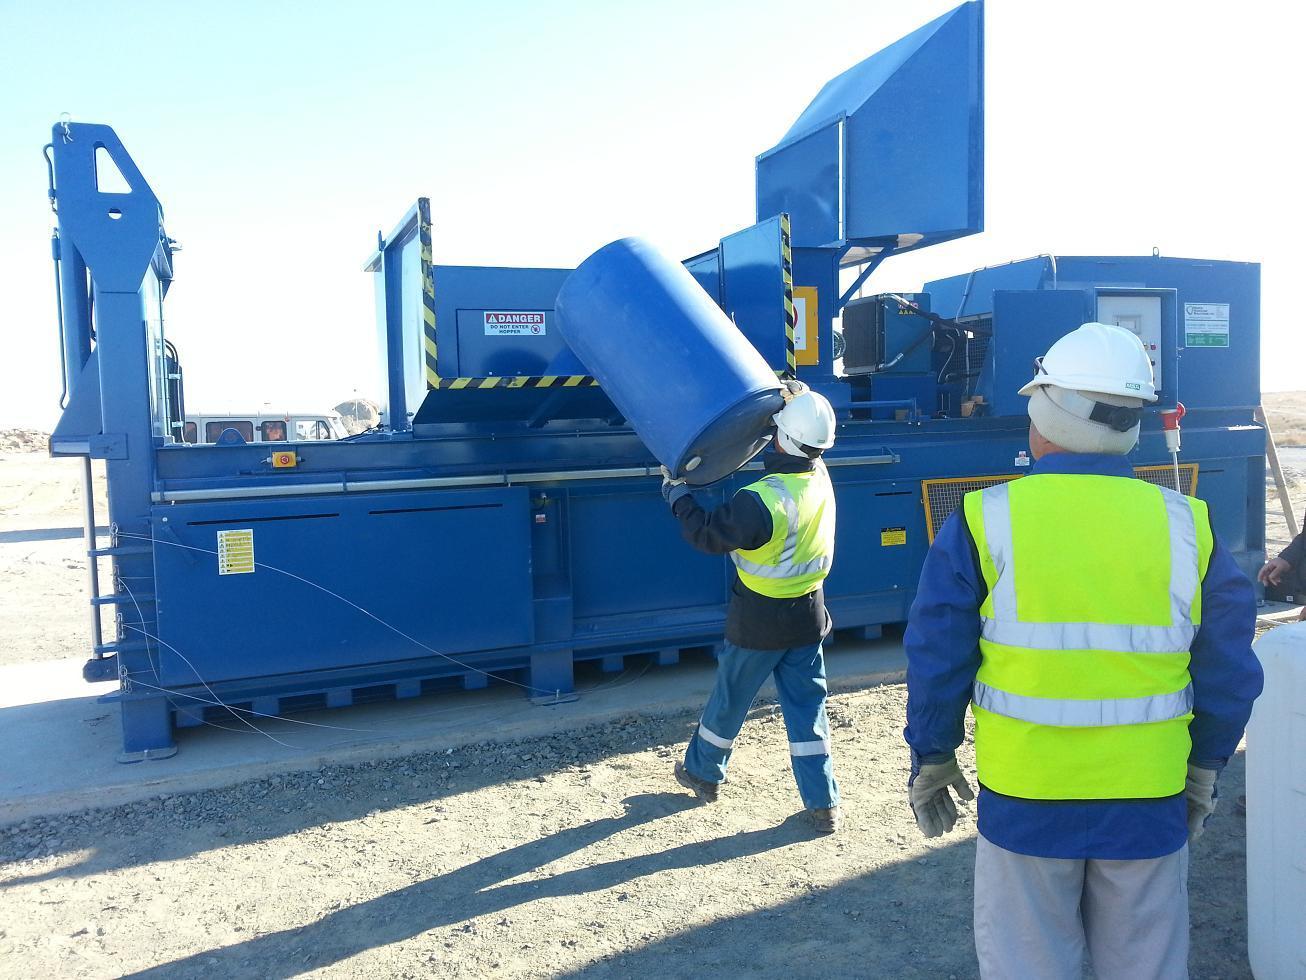 650HDE Baler in Kazakhstan - Balers 10-20 tonnes per week